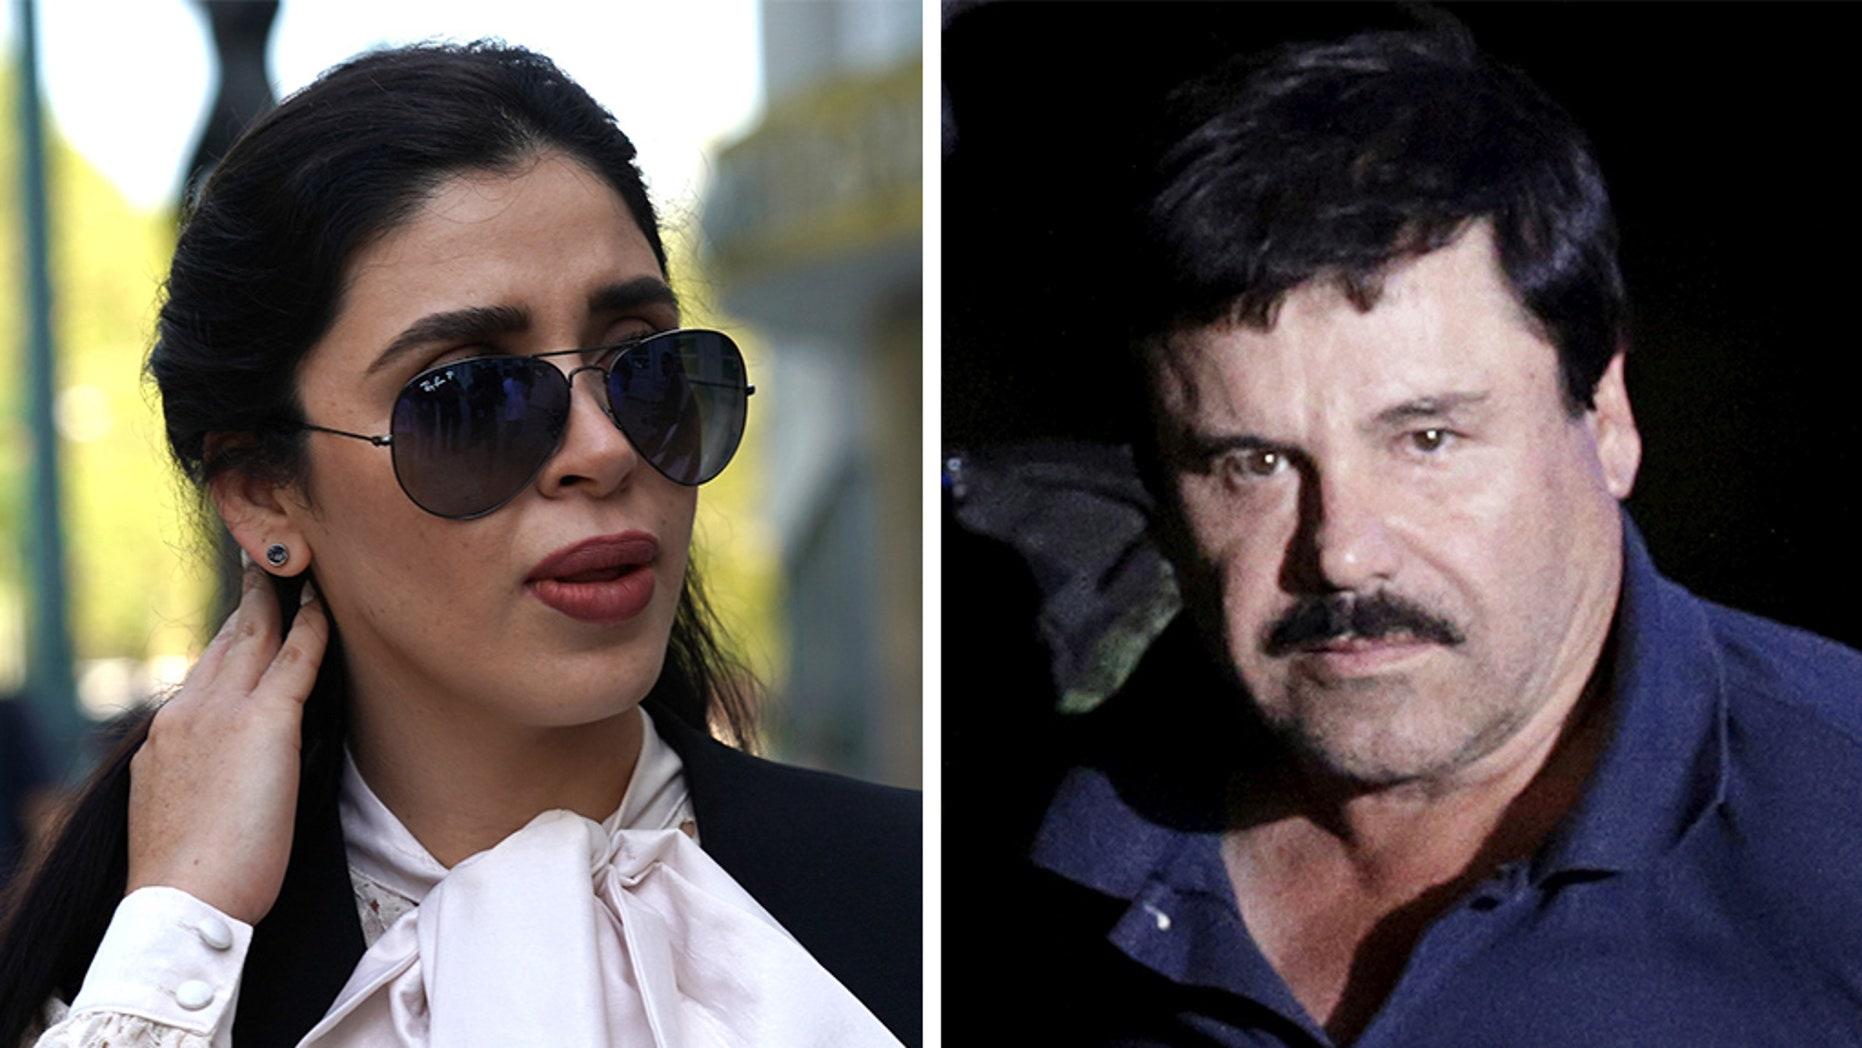 el chapo u2019s beauty queen wife disses media u2019s  u2018unfair u2019 caricature of her drug